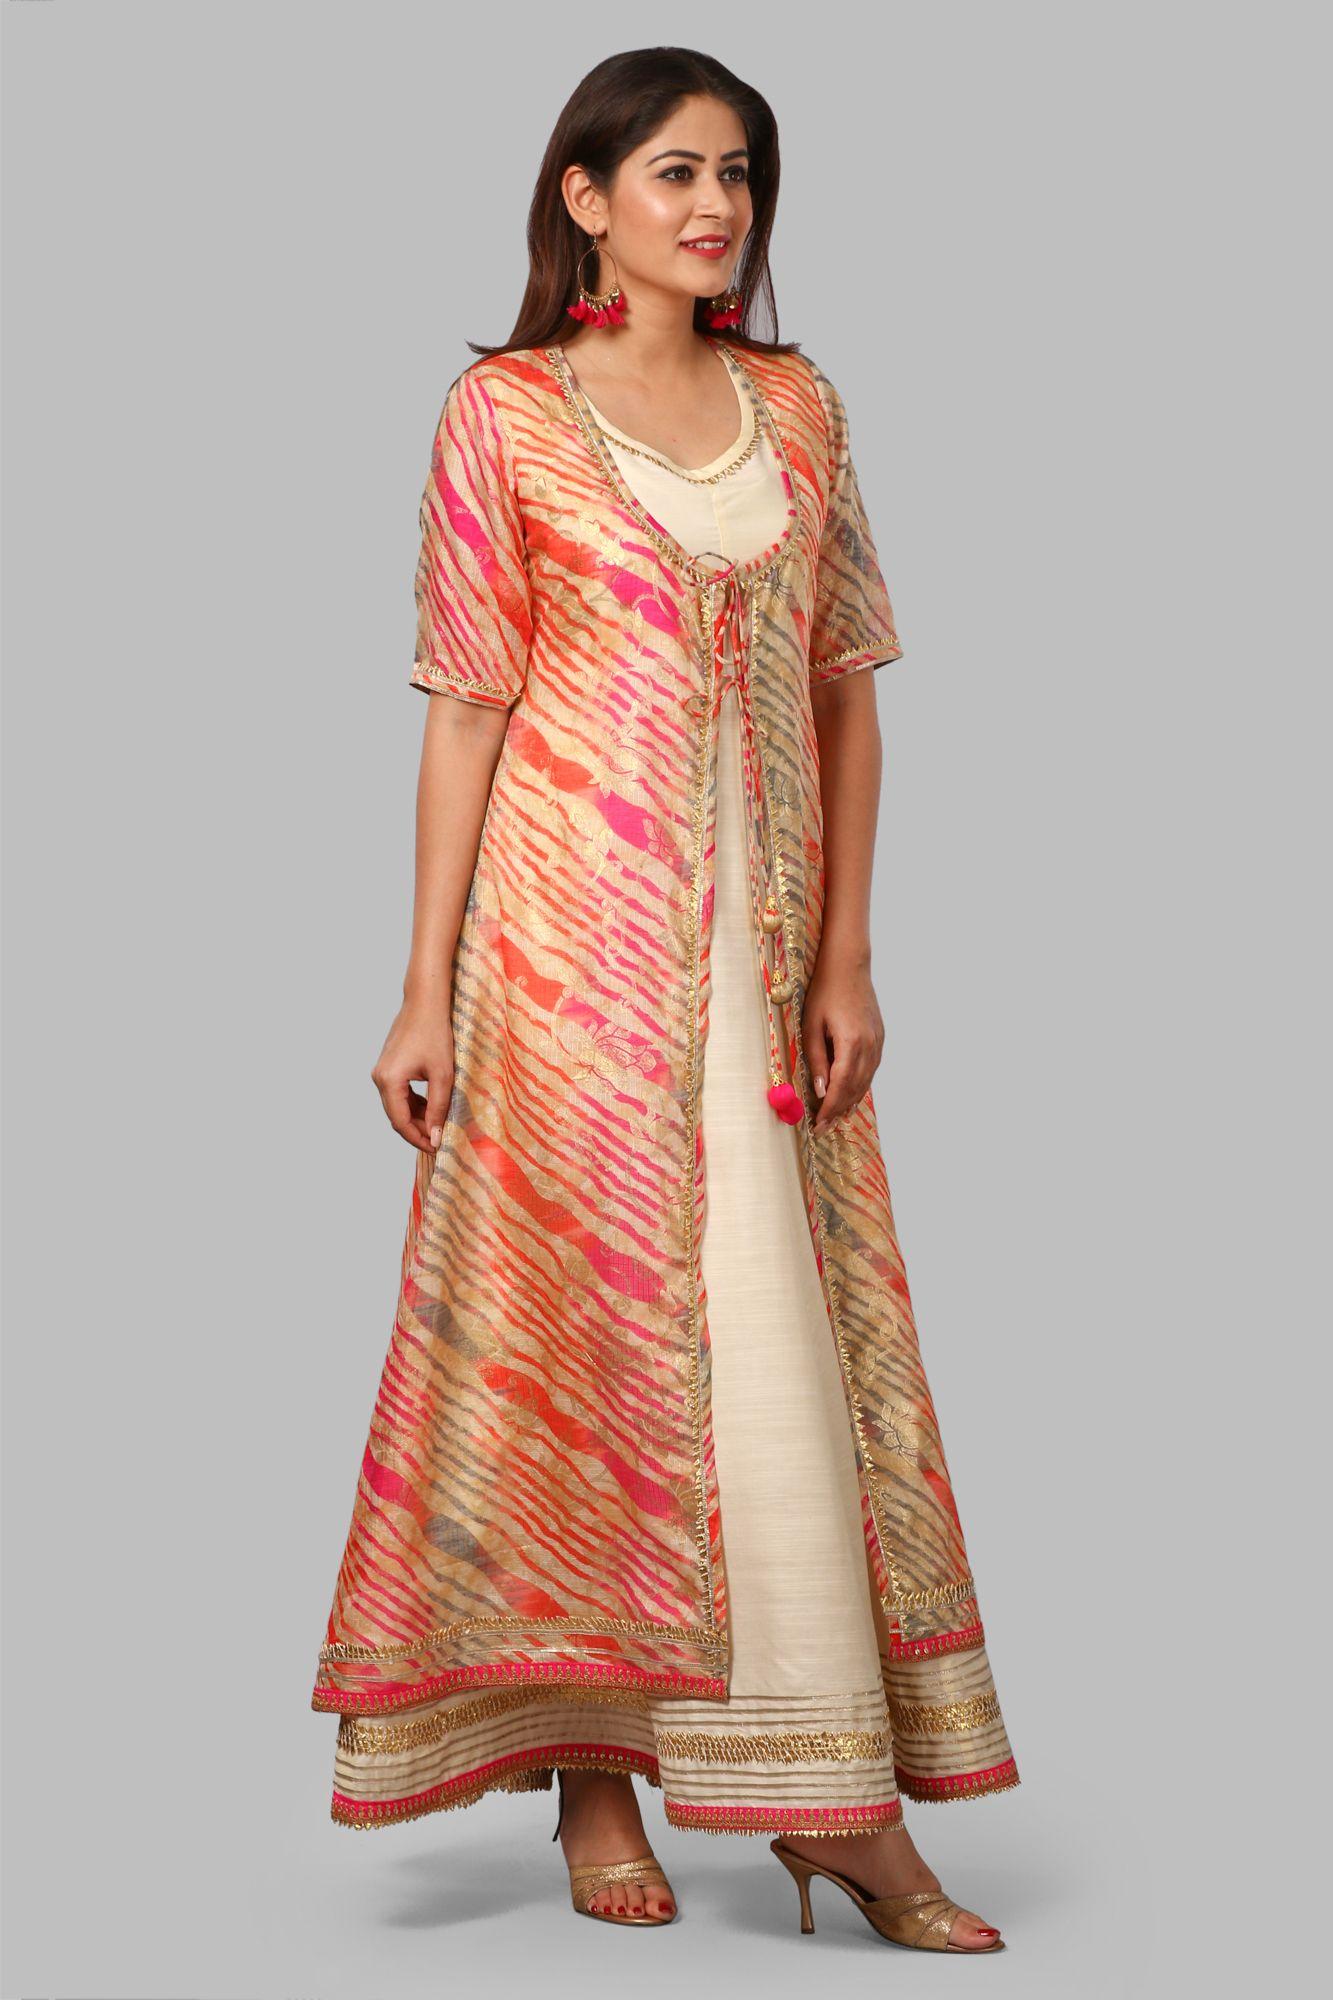 7a28dea643f52 Kurti Patiala Suit Wedding, Salwar Kurta, Sharara, Anarkali, Floor Length  Kurti,